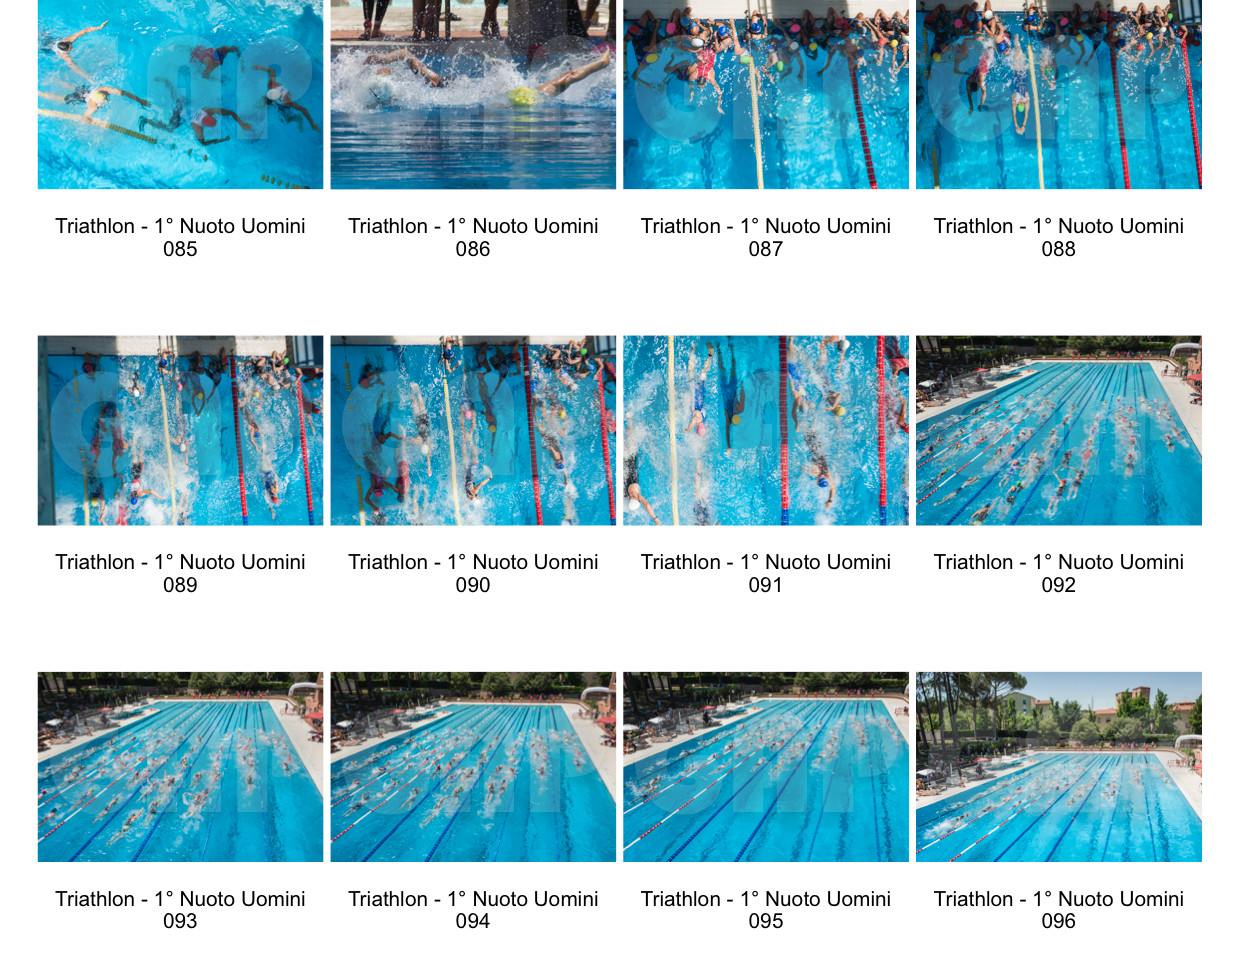 Triathlon_V.Elsa_-_1°_Frazione_Nuoto_Uomini_-05.jpg